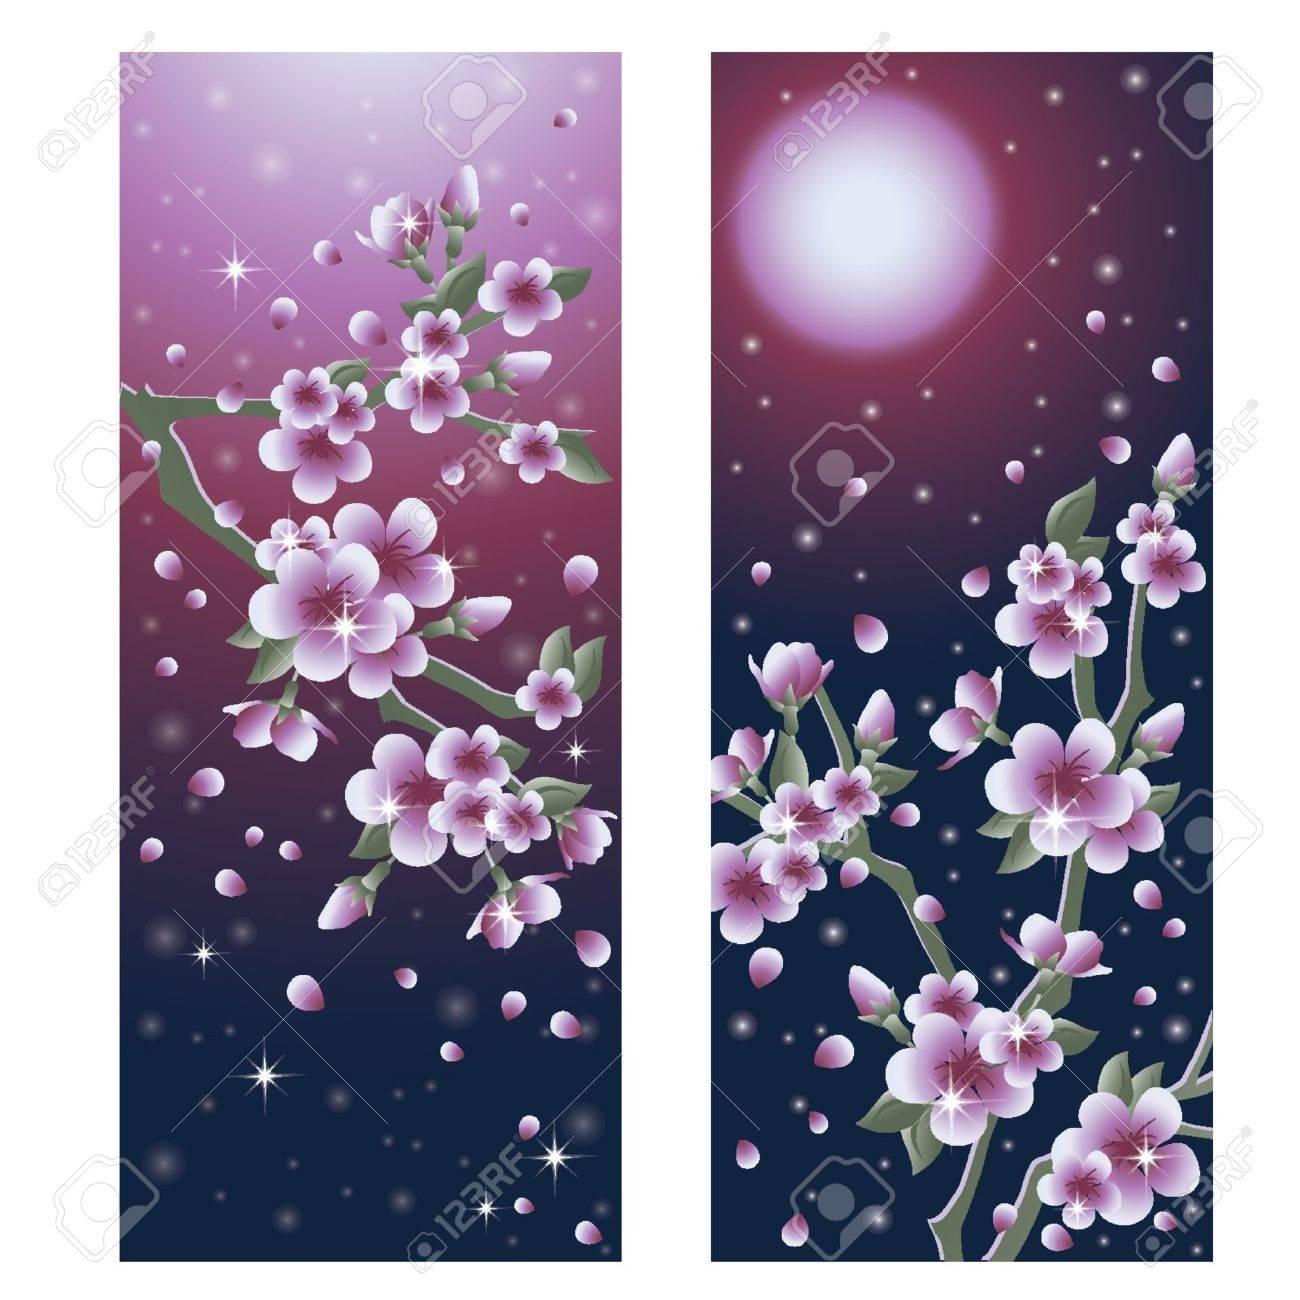 Beautiful Sacura banners, vector illustration Stock Vector - 12484724